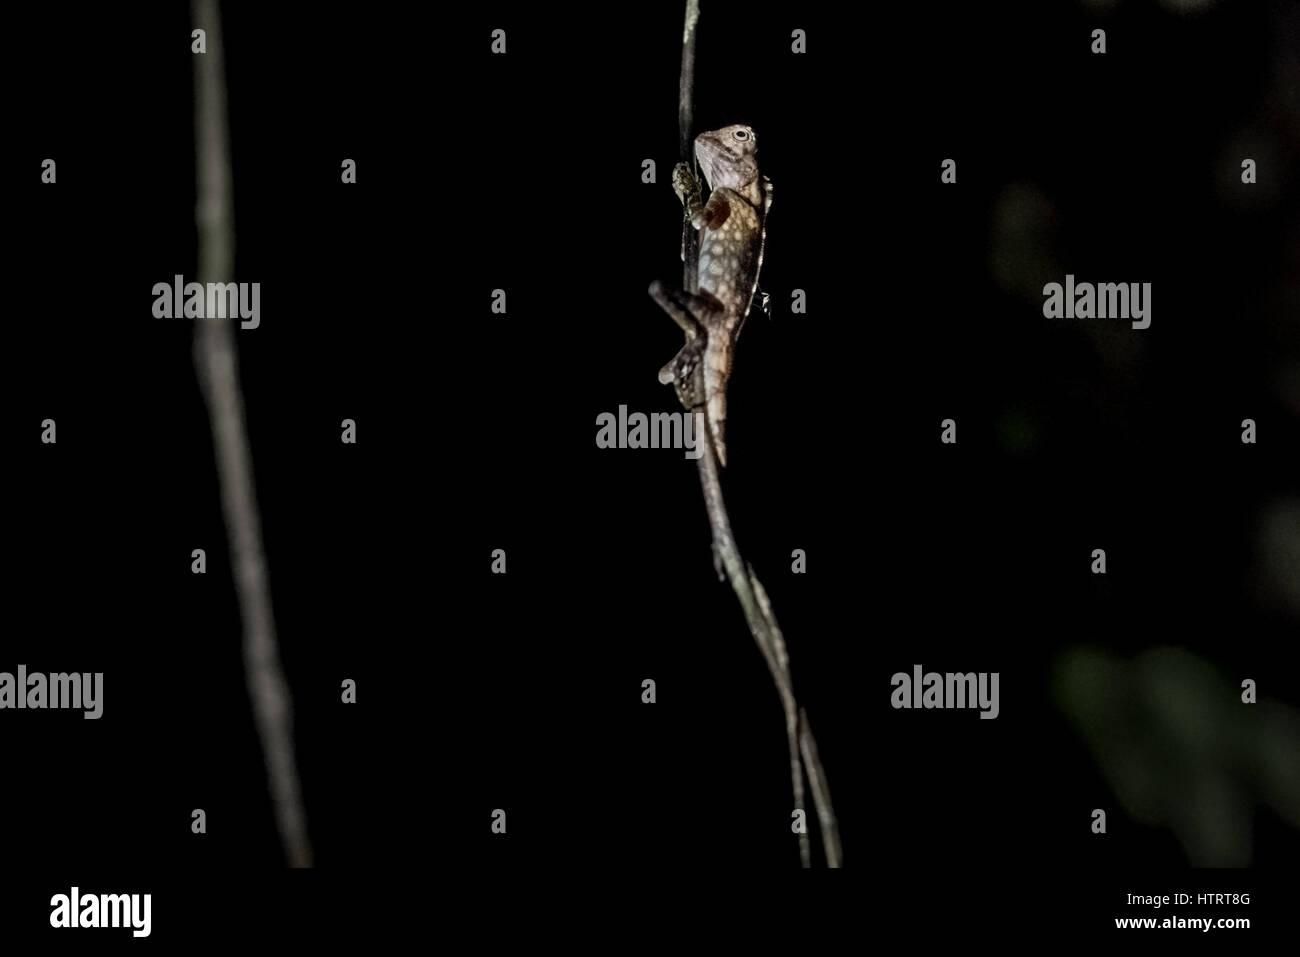 Wild Borneo anglehead lizard (Gonocephalus bornensis) climbing aerial roots. © Reynold Sumayku - Stock Image